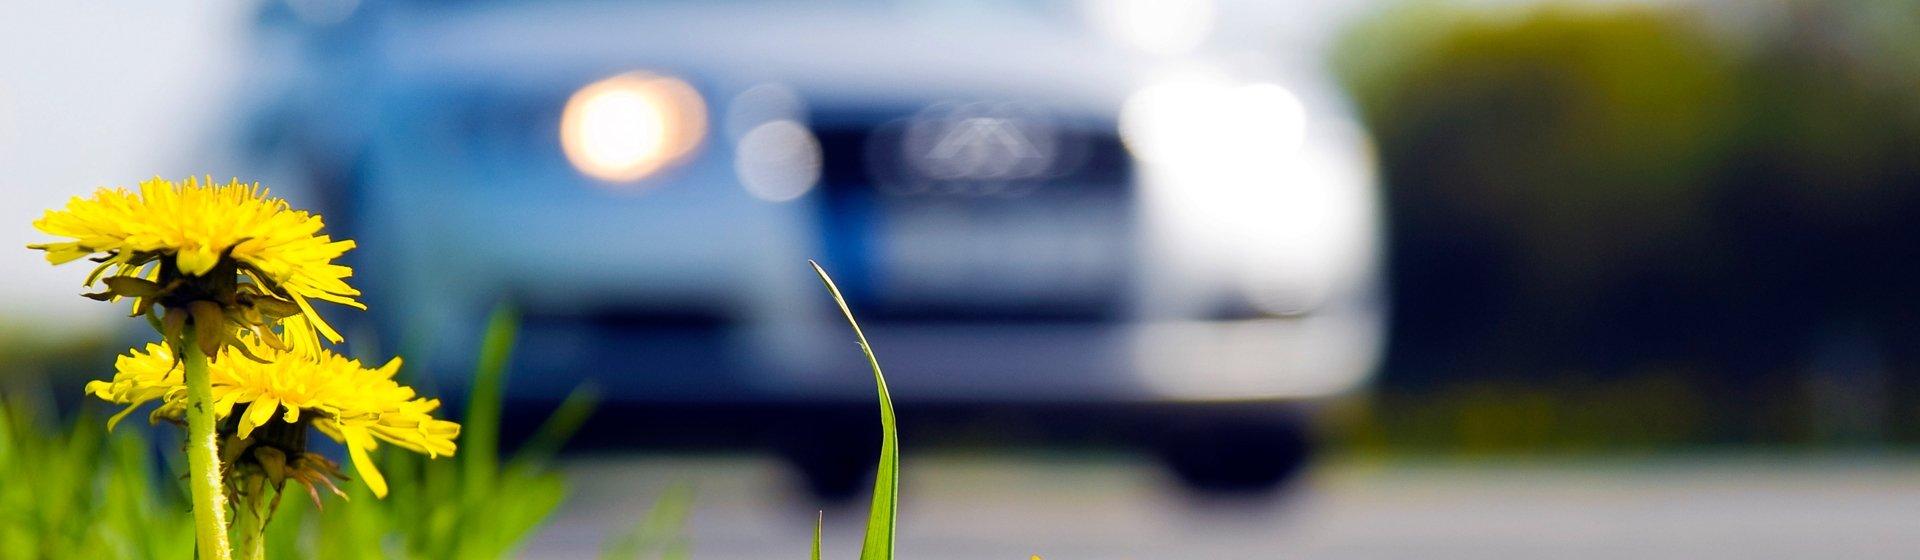 'Autobezitter onnodig duur verzekerd'